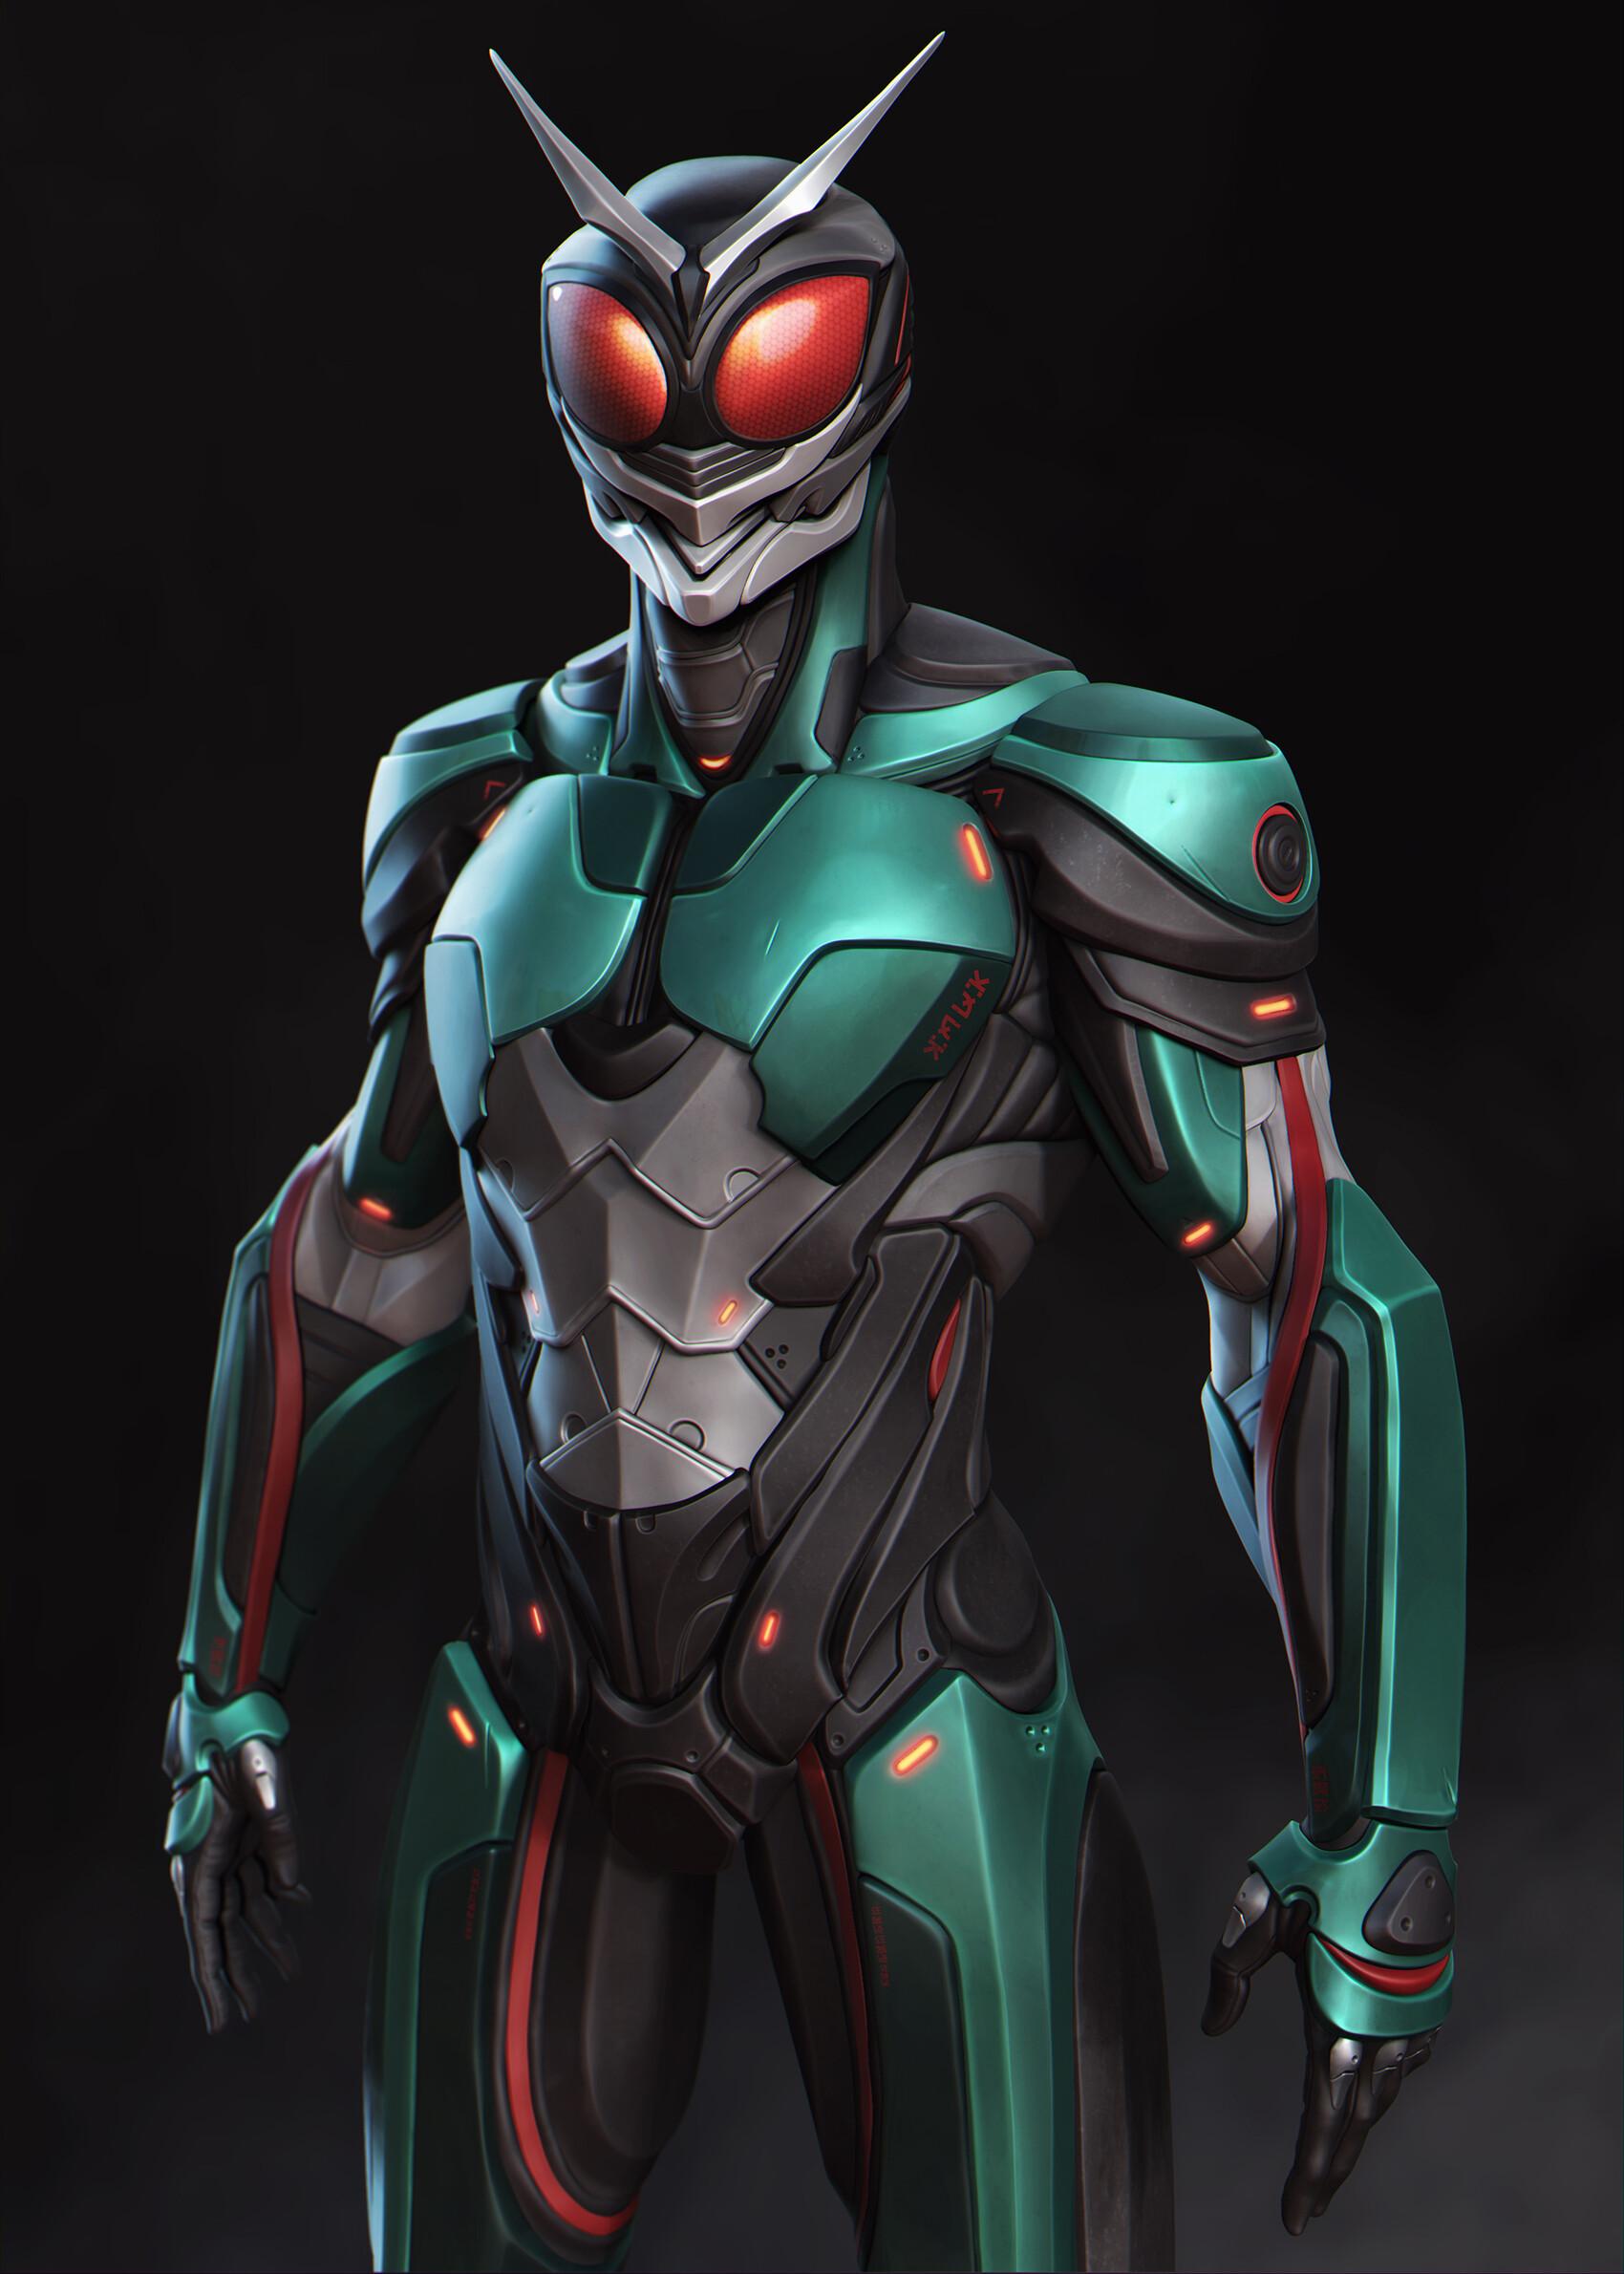 ArtStation - Kamen Rider Black RX, Raphael Perroni